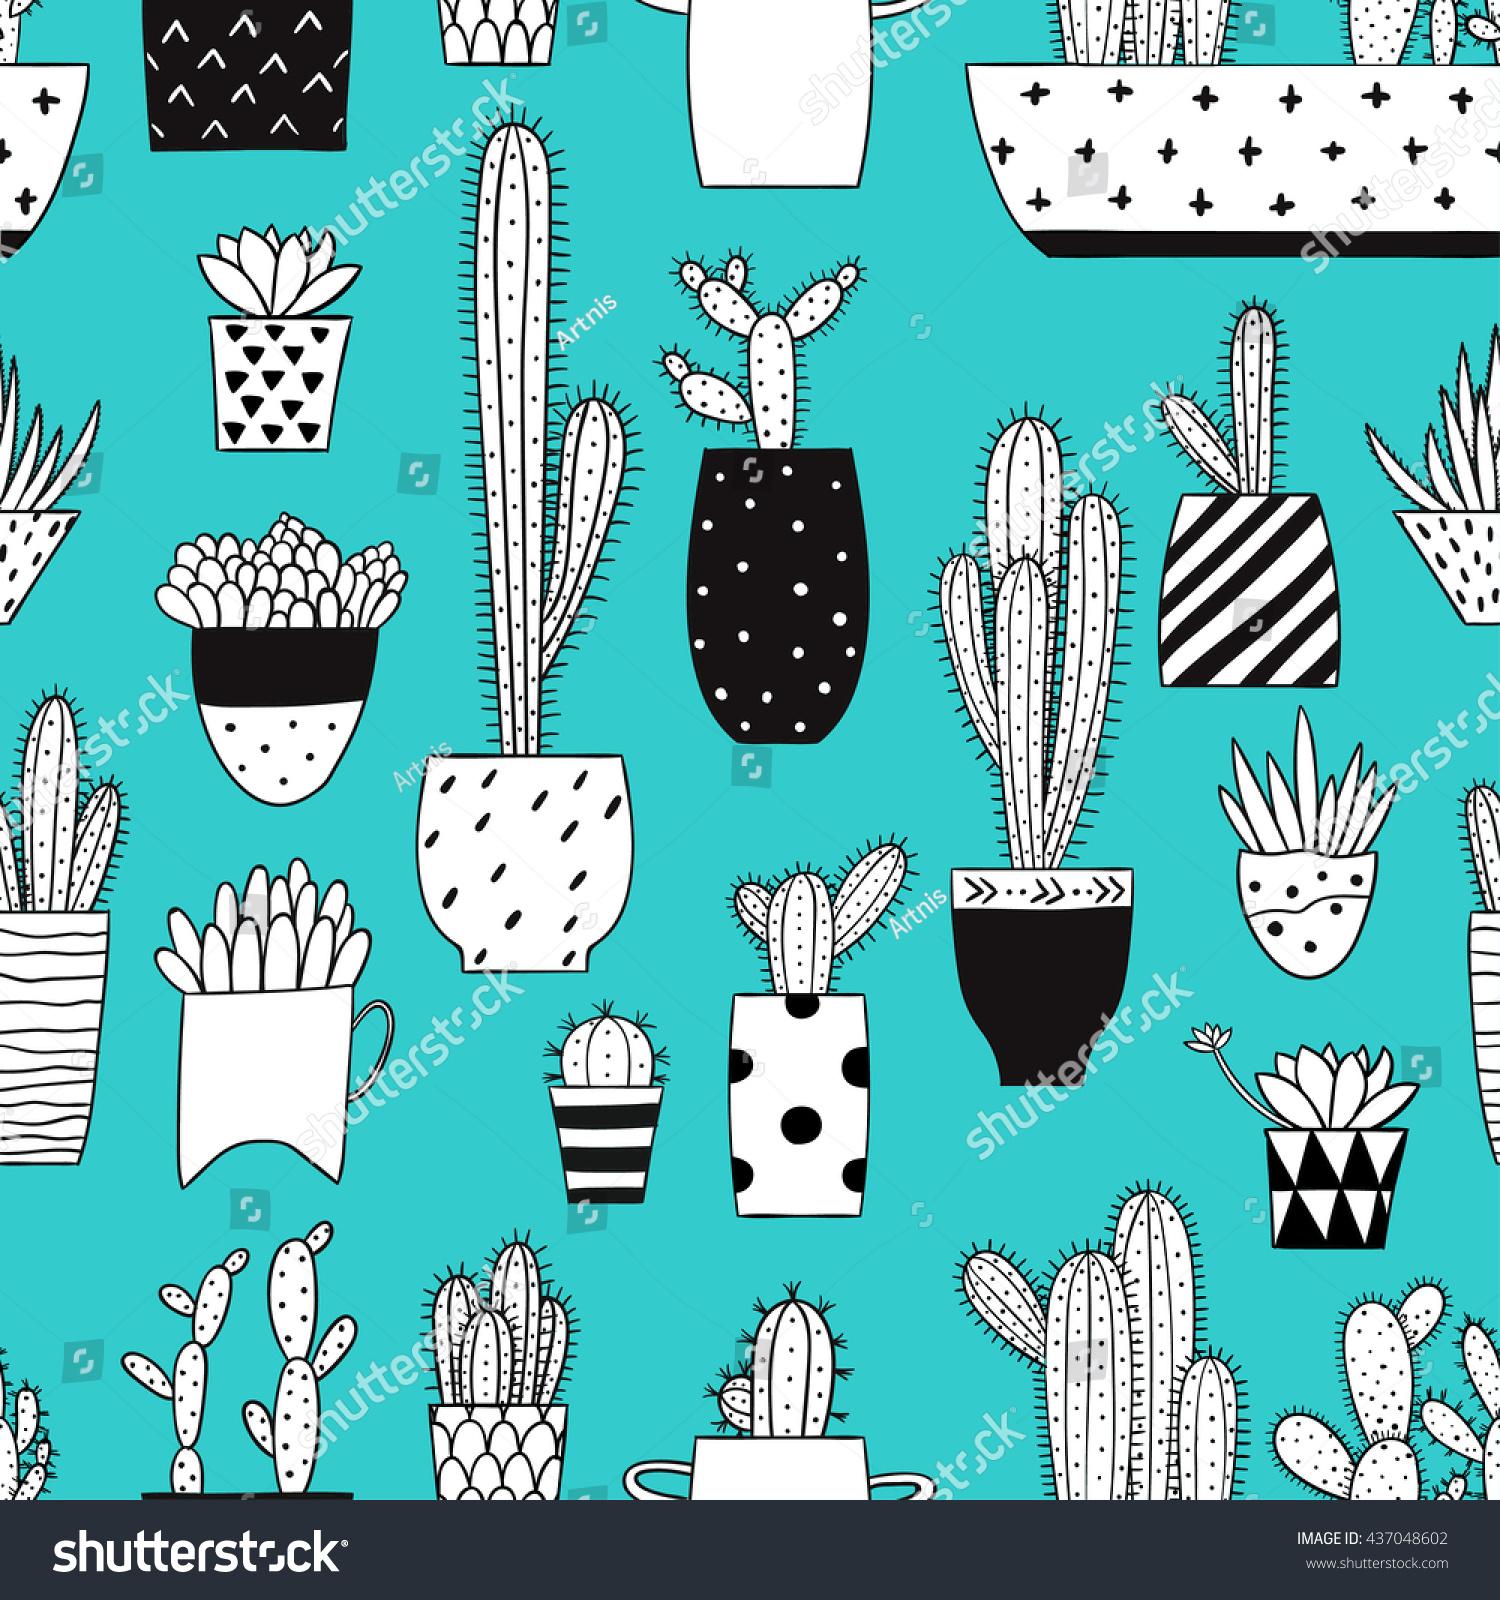 Seamless Pattern Hand Drawn Cacti Succulents Stock Vector Auto Epc Novyc Leds Wiring Diagram Black White Cactus